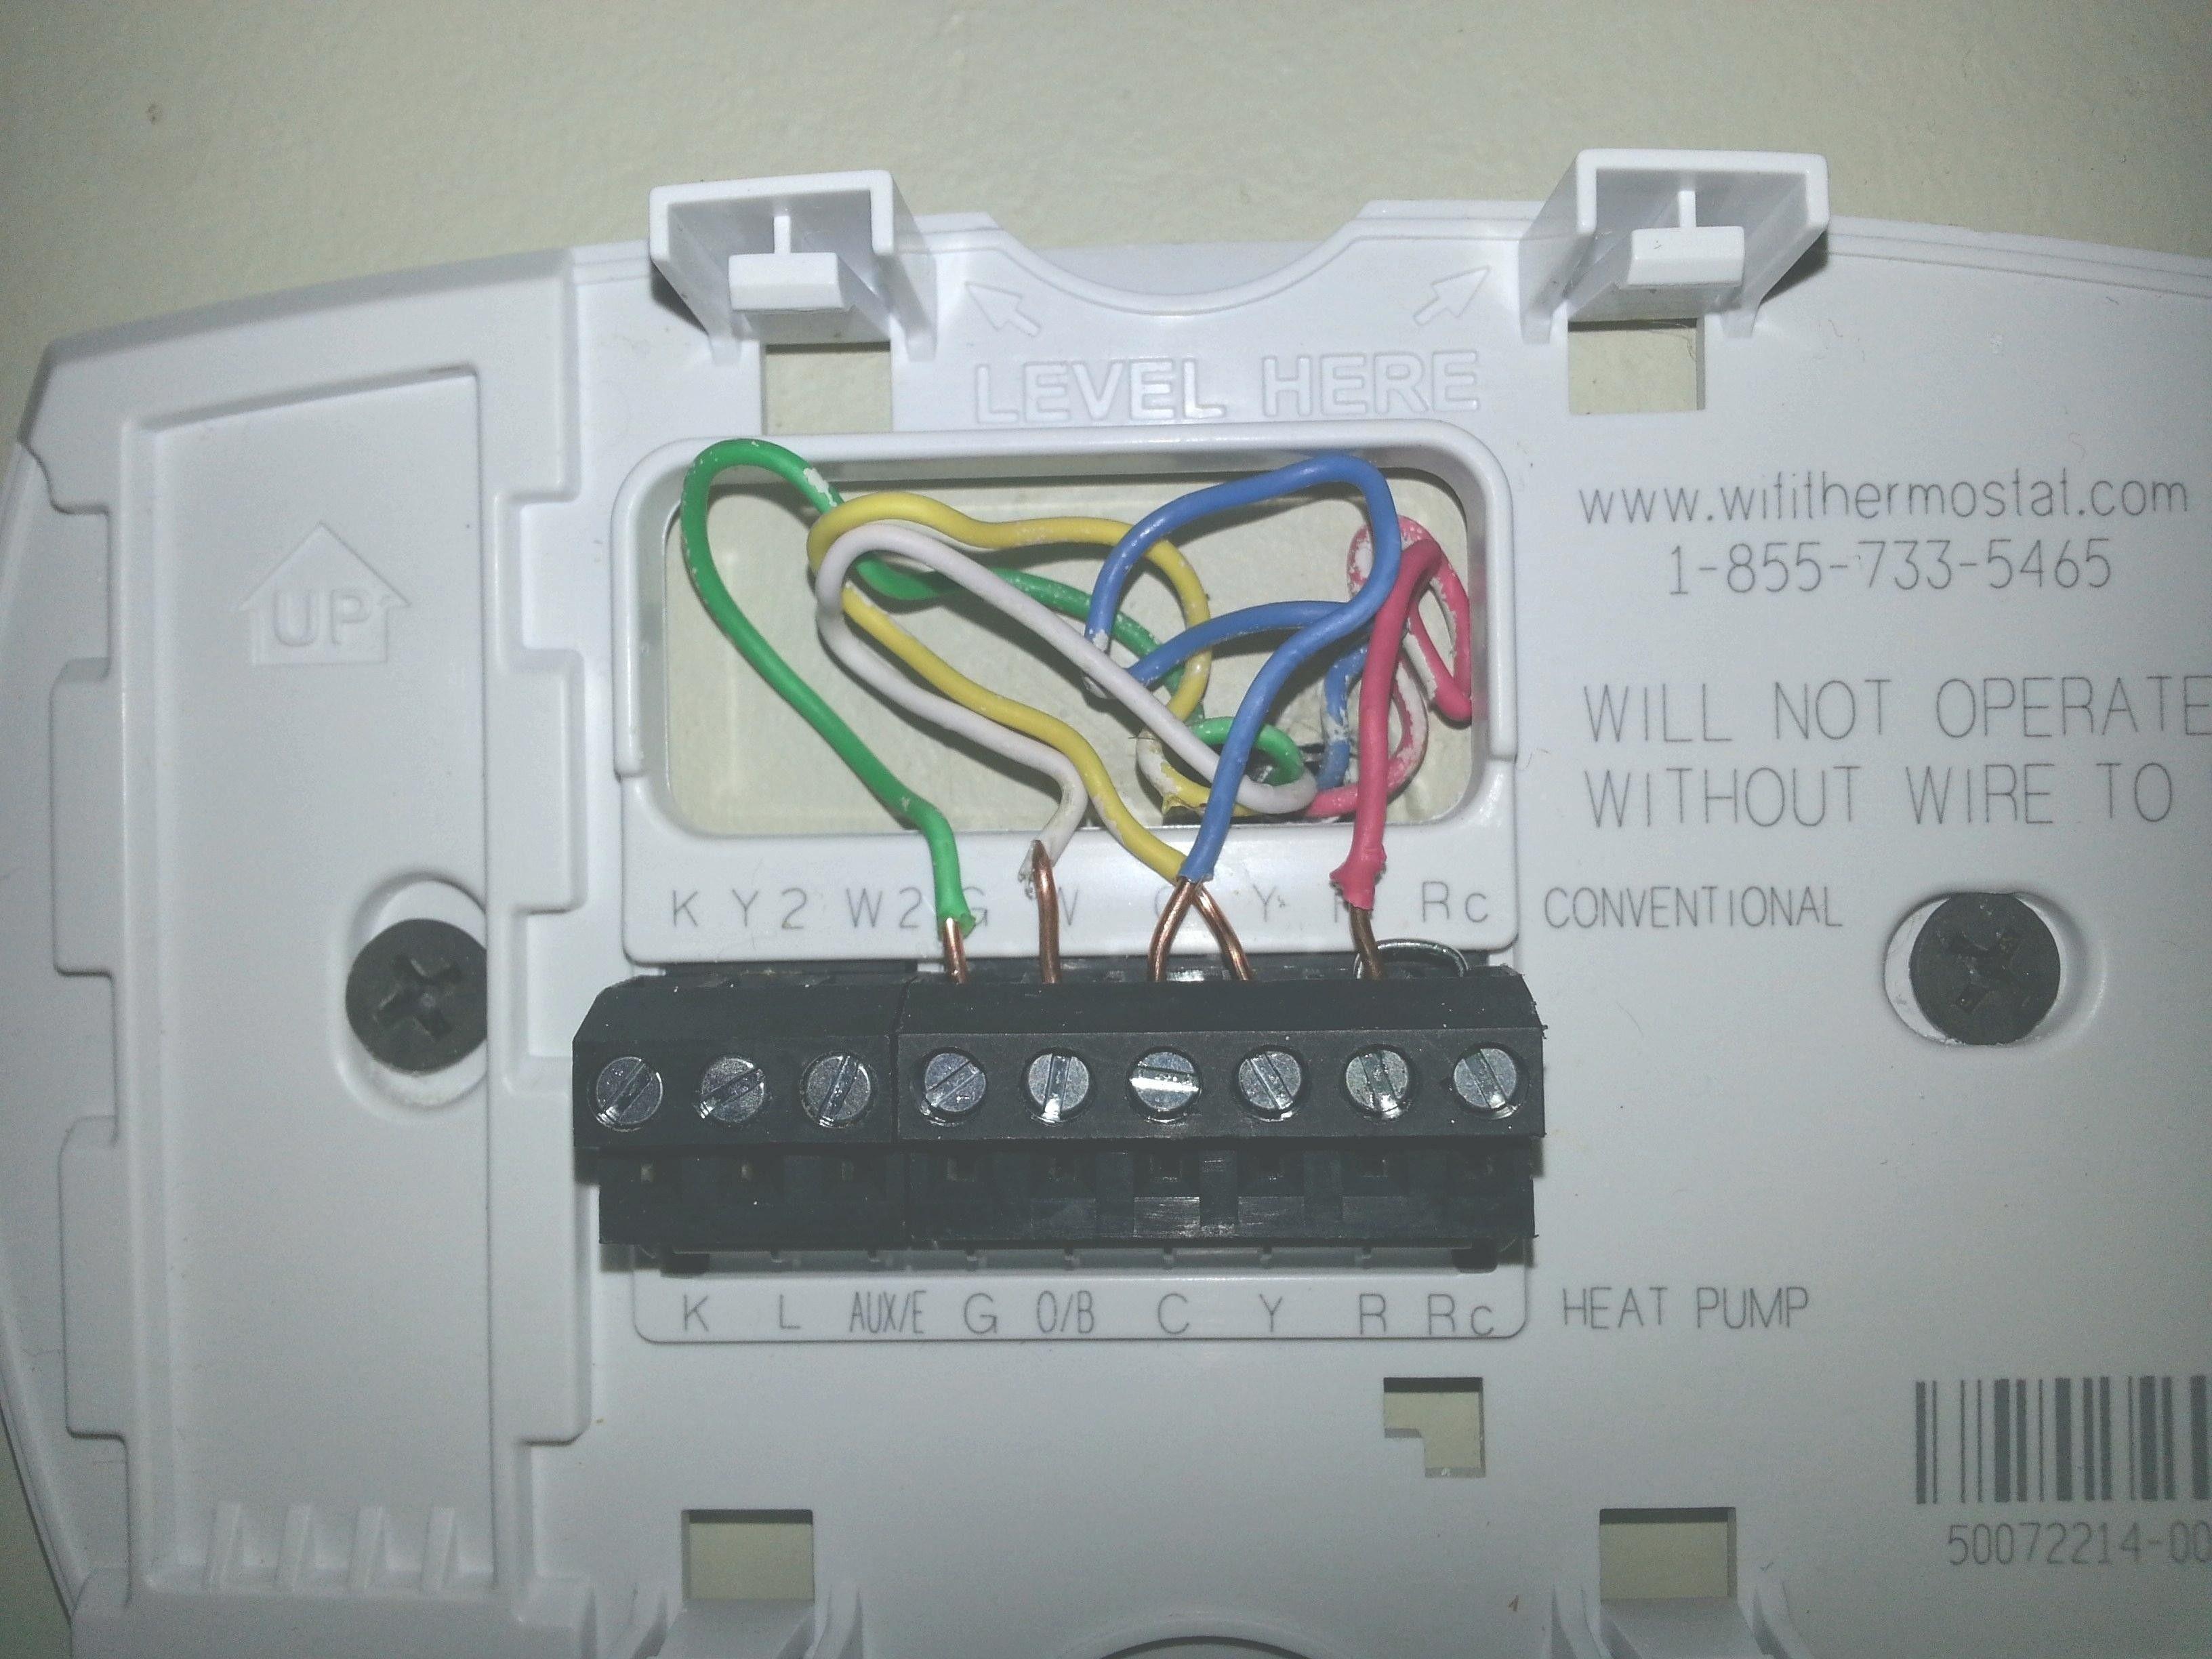 Awesome Honeywell Focuspro 5000 Wiring Diagram Honeywell Wifi Thermostat Heater Thermostat Thermostat Wiring